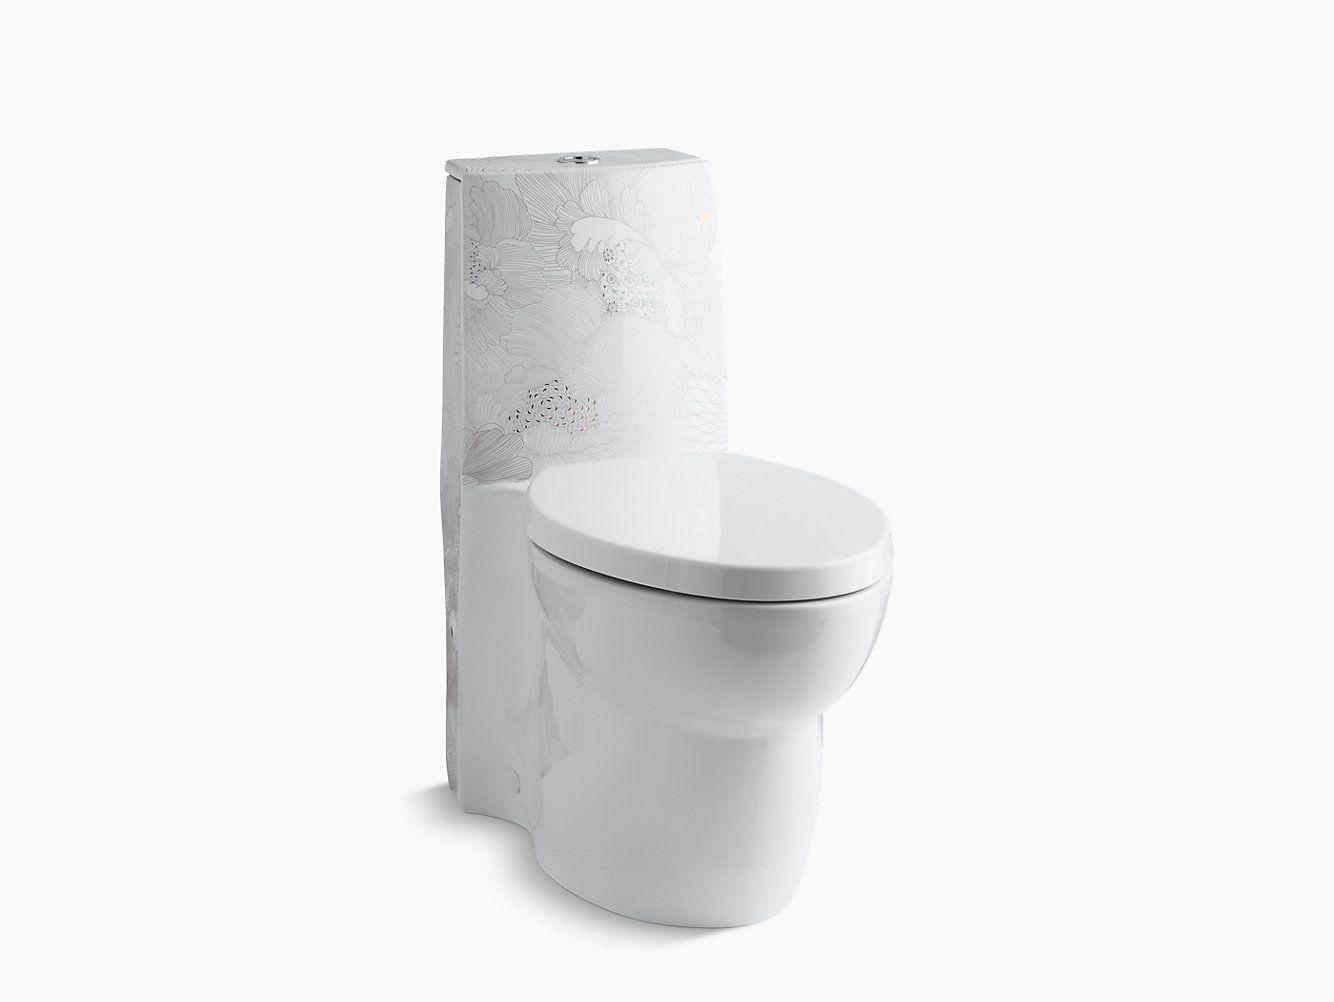 Kohler K 14338 Smc Empress Bouquet Design On Saile Dual Flush Toilet Kohler With Images Dual Flush Toilet Power Room Townhouse Designs